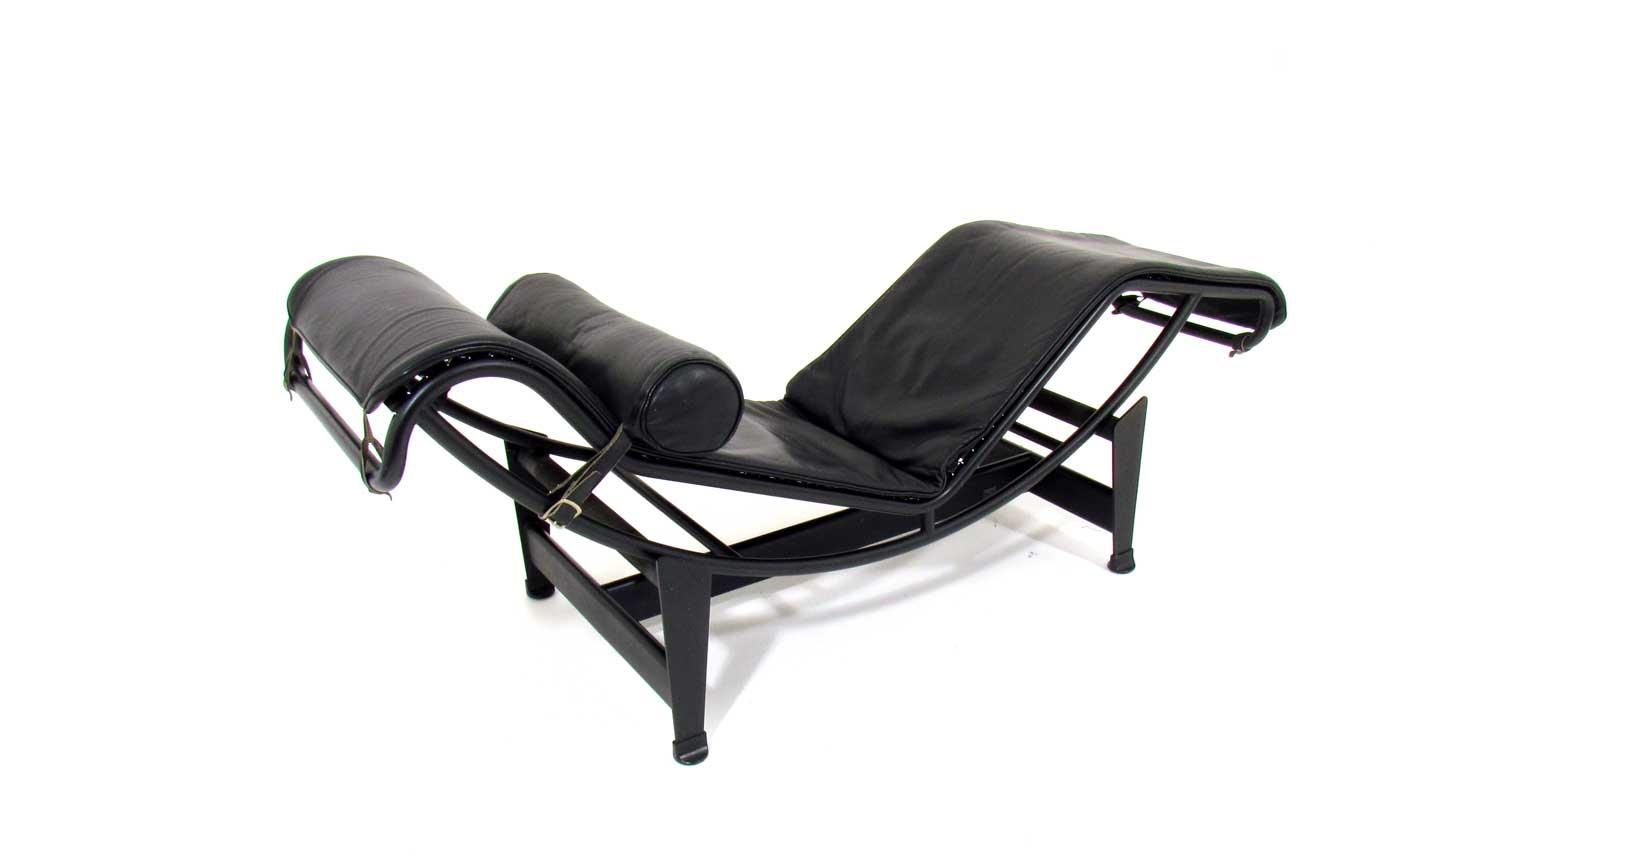 lc4 chaise lounge cassina pelle leather chair armchair seduta relax sofa vintage iconic design furniture le corbusier